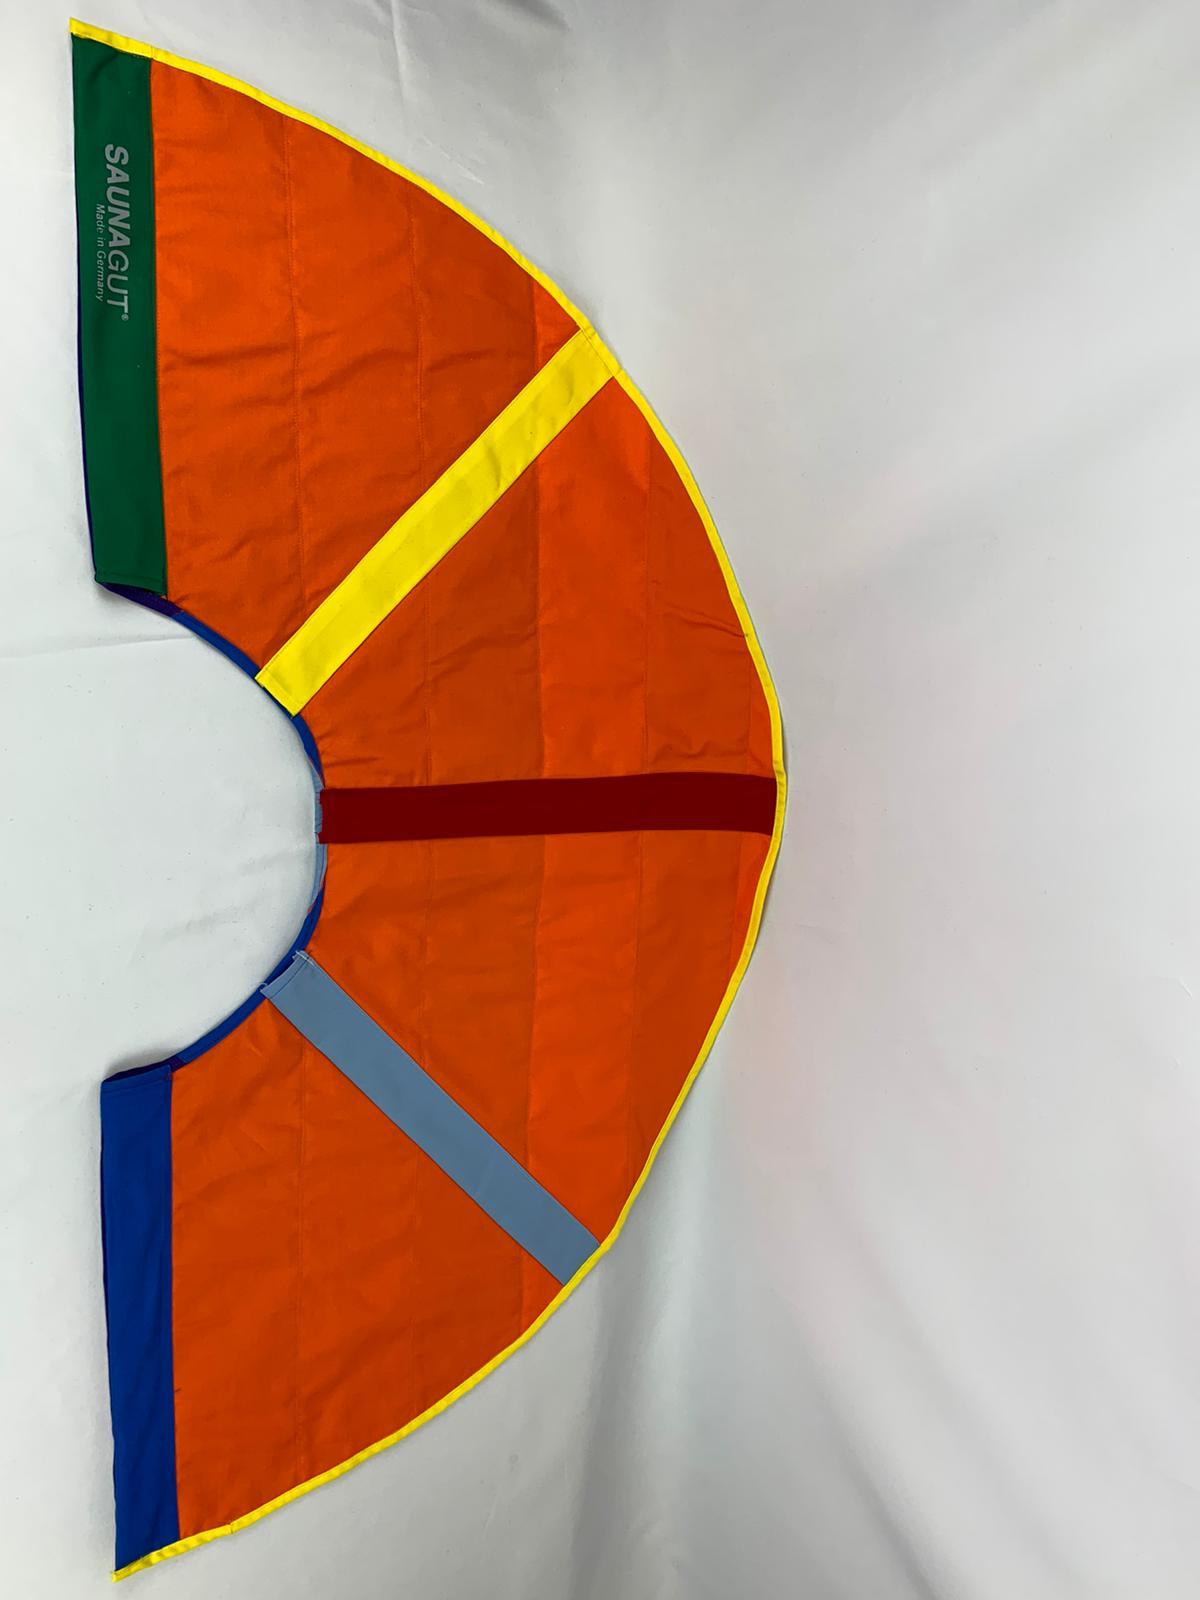 003-ES-AFS-OGGRGB   Ersatzstoff Aufgussfächer STANDARD Orange-Grün-Gelb-Rot-Grau-Blau